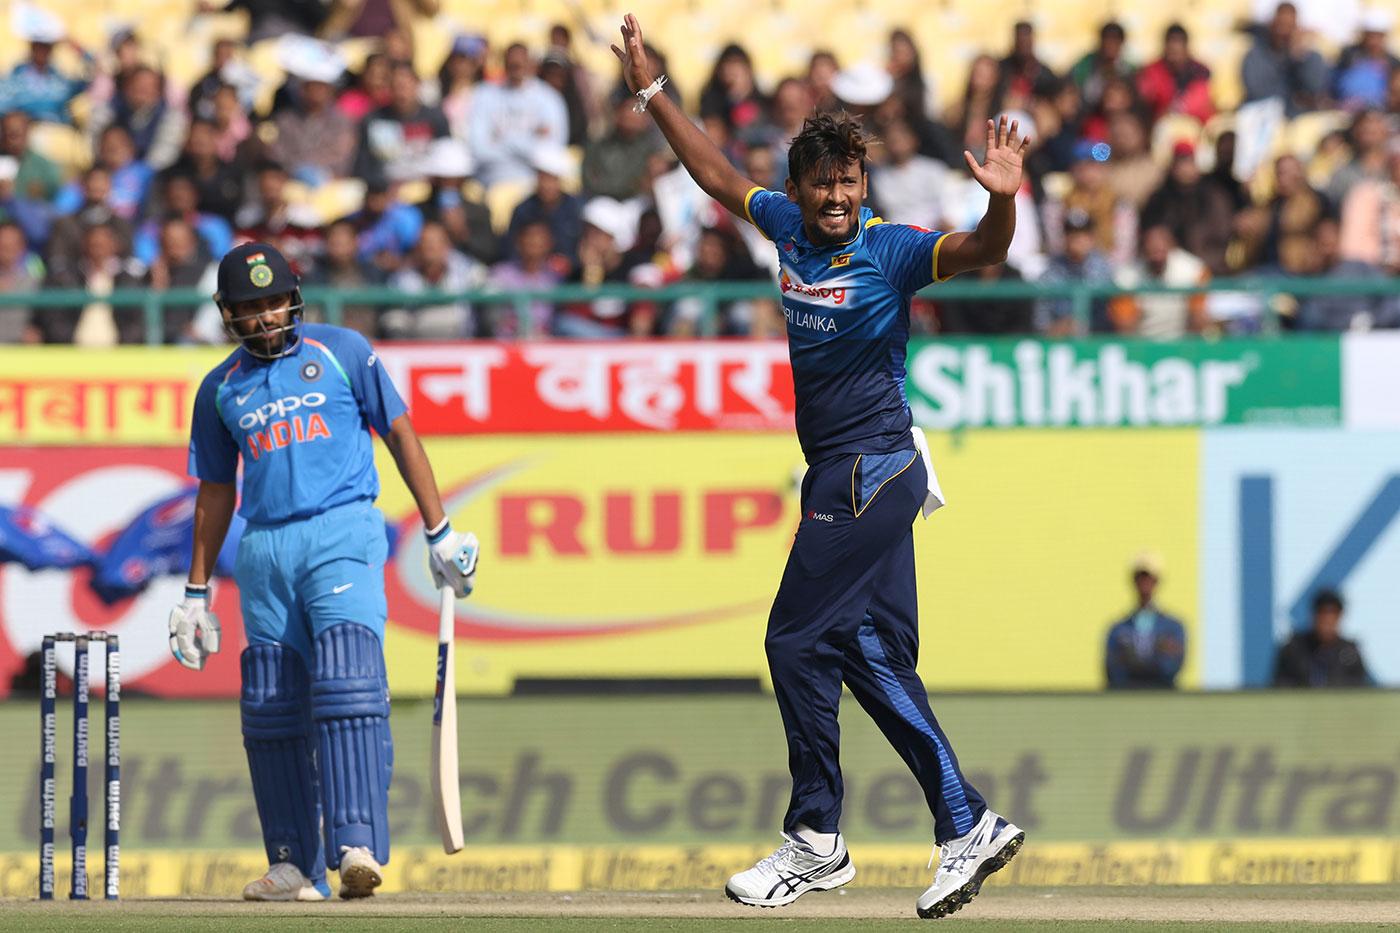 3rd ODI (D/N), Sri Lanka tour of India at Visakhapatnam, Dec 17 2017 | Match Report | ESPNCricinfo